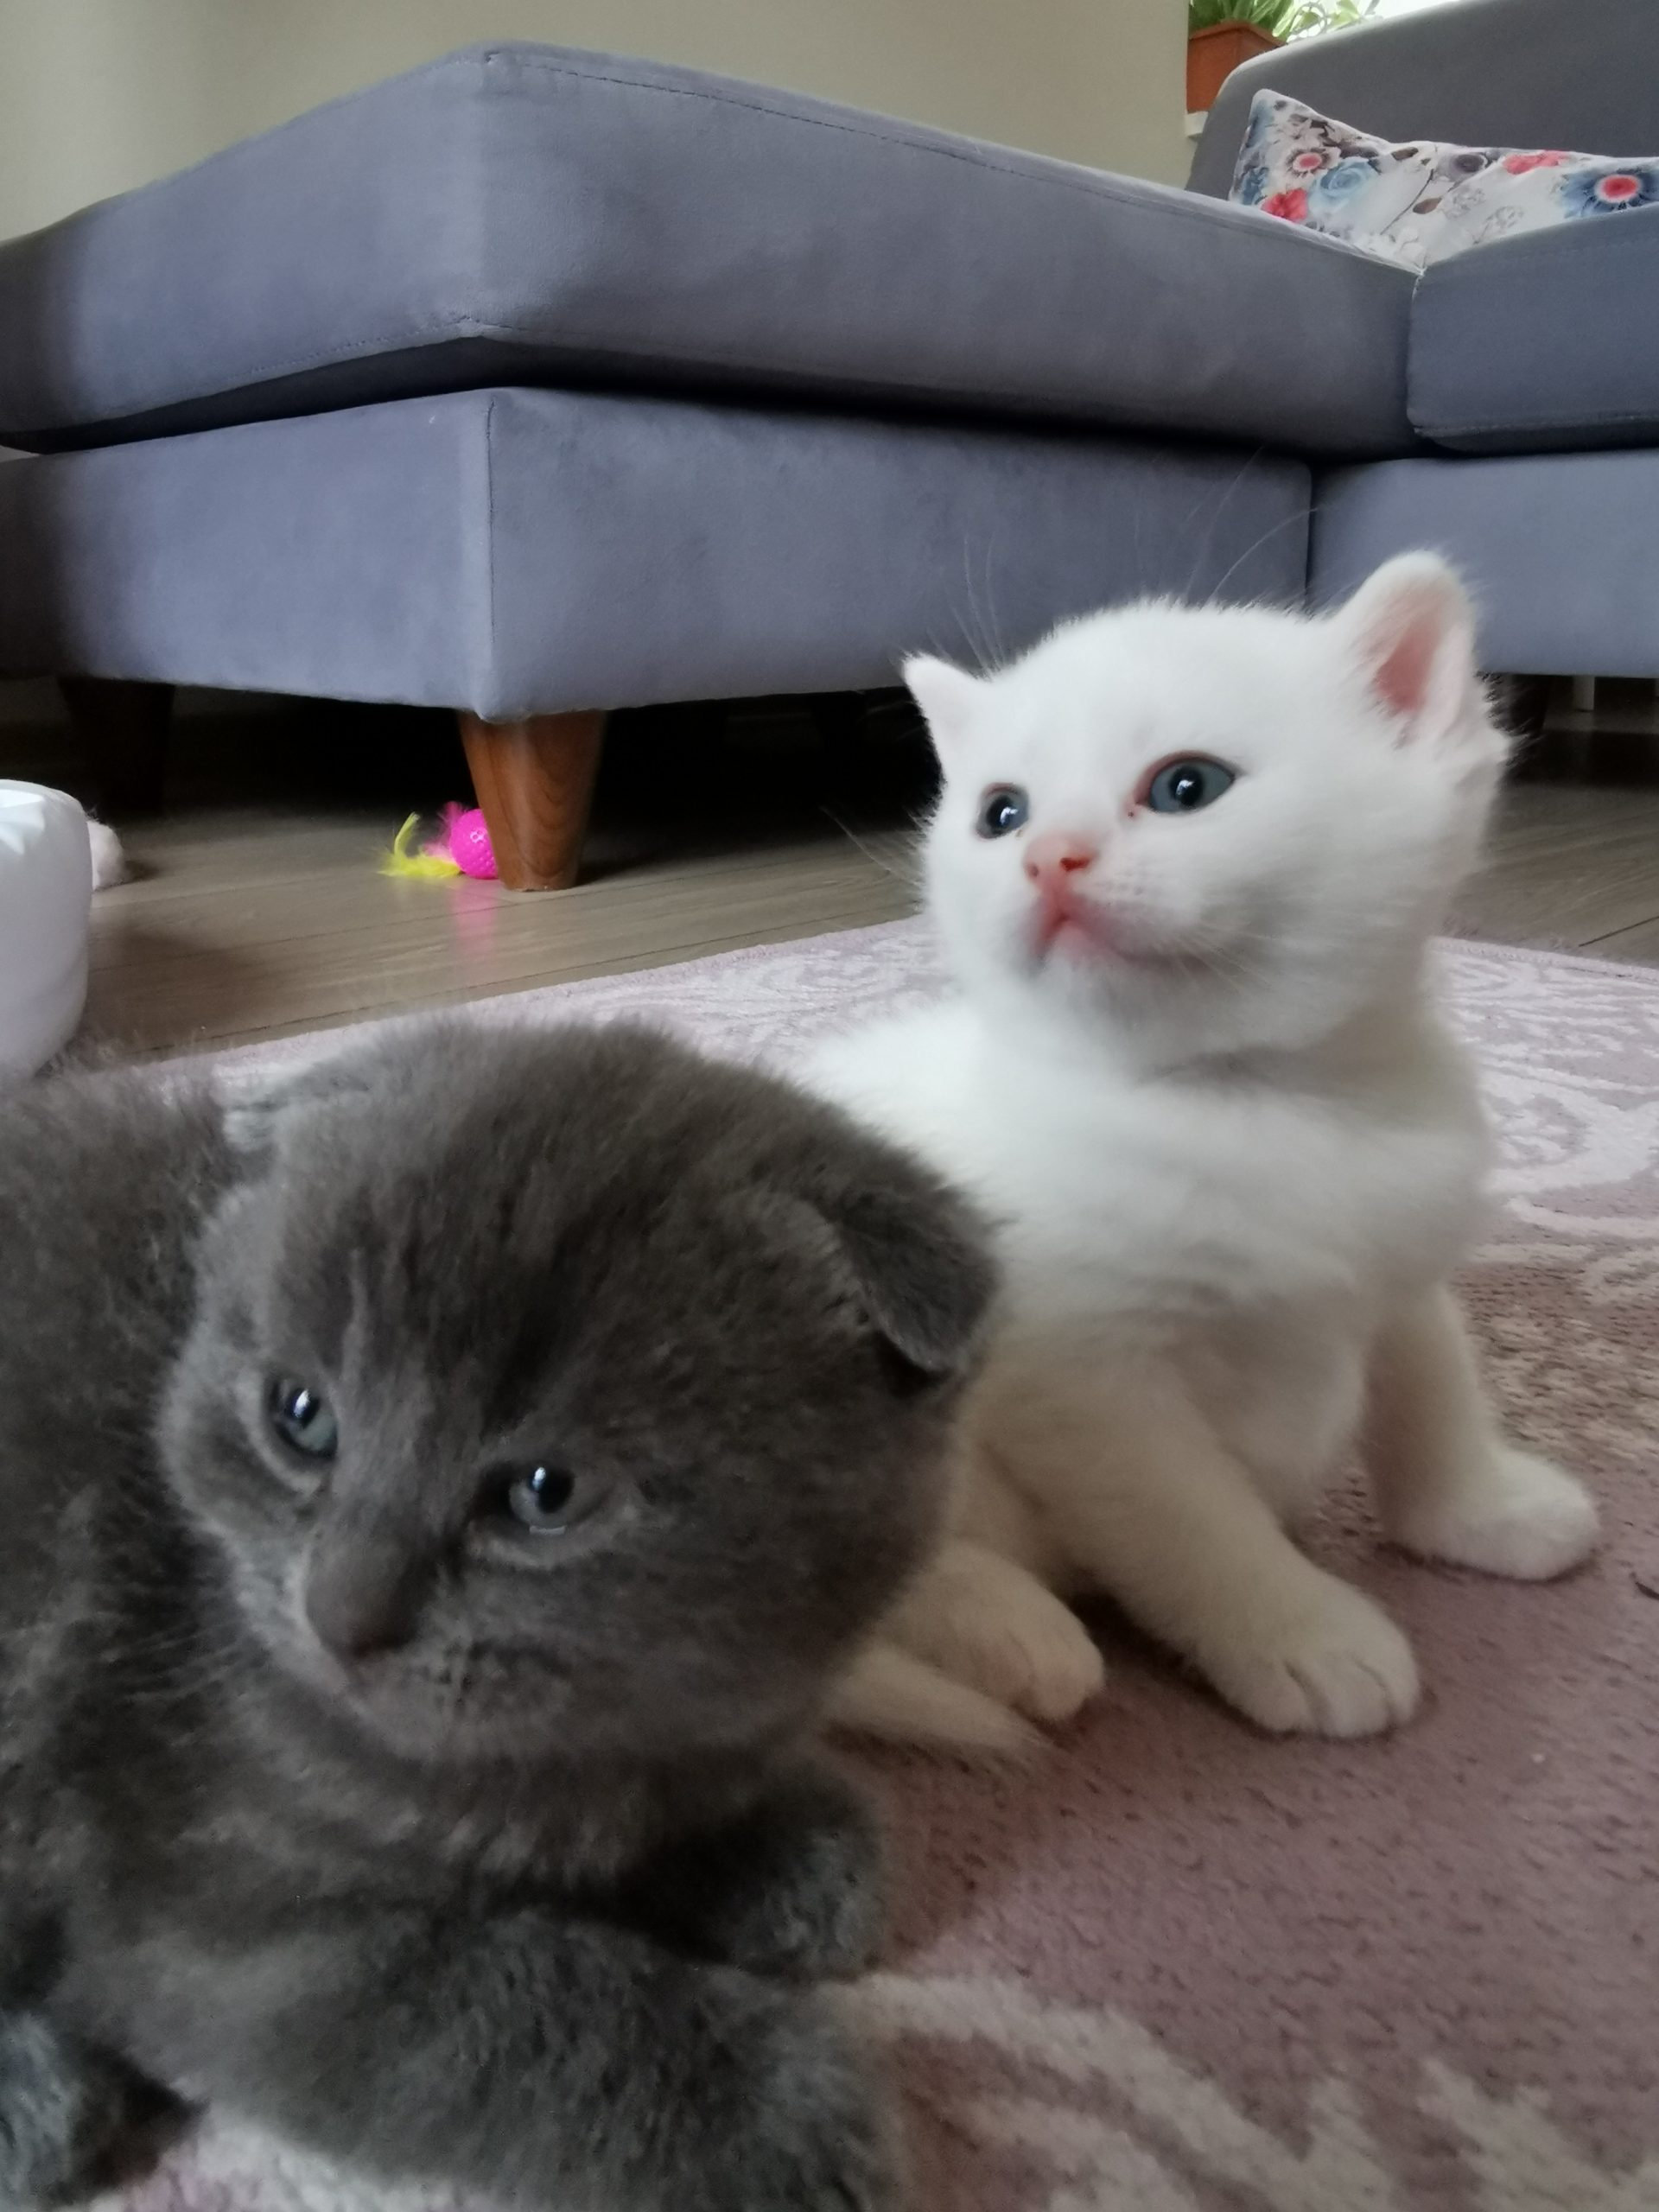 Yavru Kedi Eğitimi | Yavru Kedi Oyunu